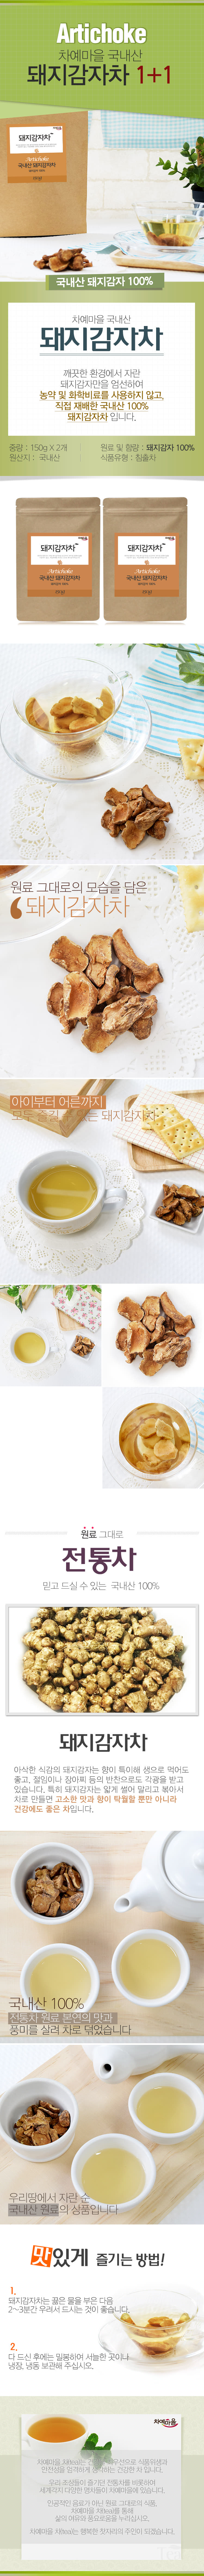 [ InterTeeHandel ] [Chayemaul/茶艺村] 韩国产 菊芋茶 150g 1个+1个